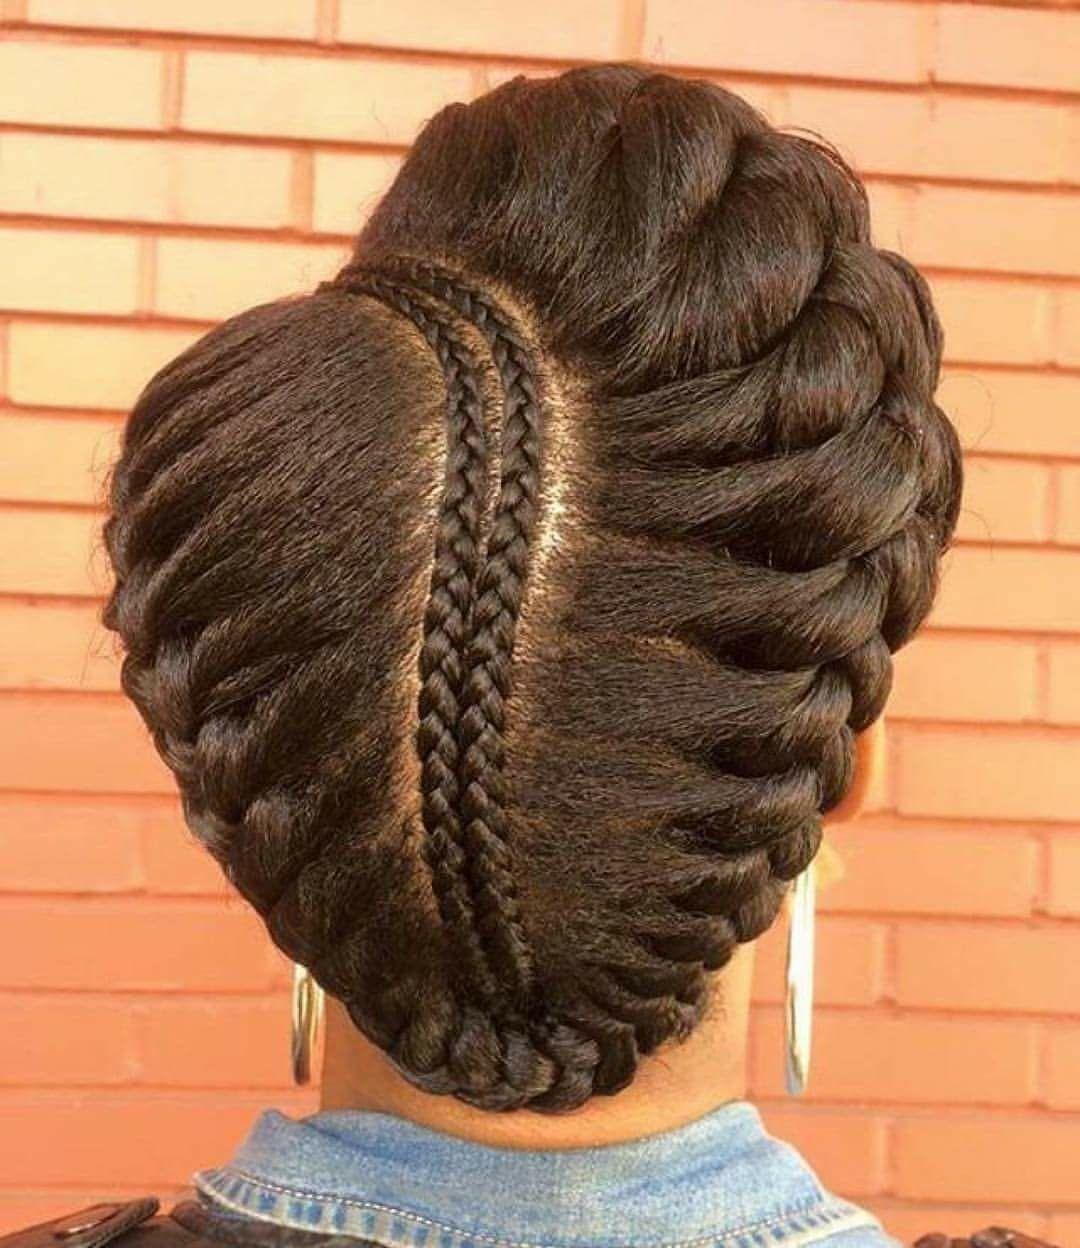 Growyourcrown hairspectacle hair pinterest fizzy hair